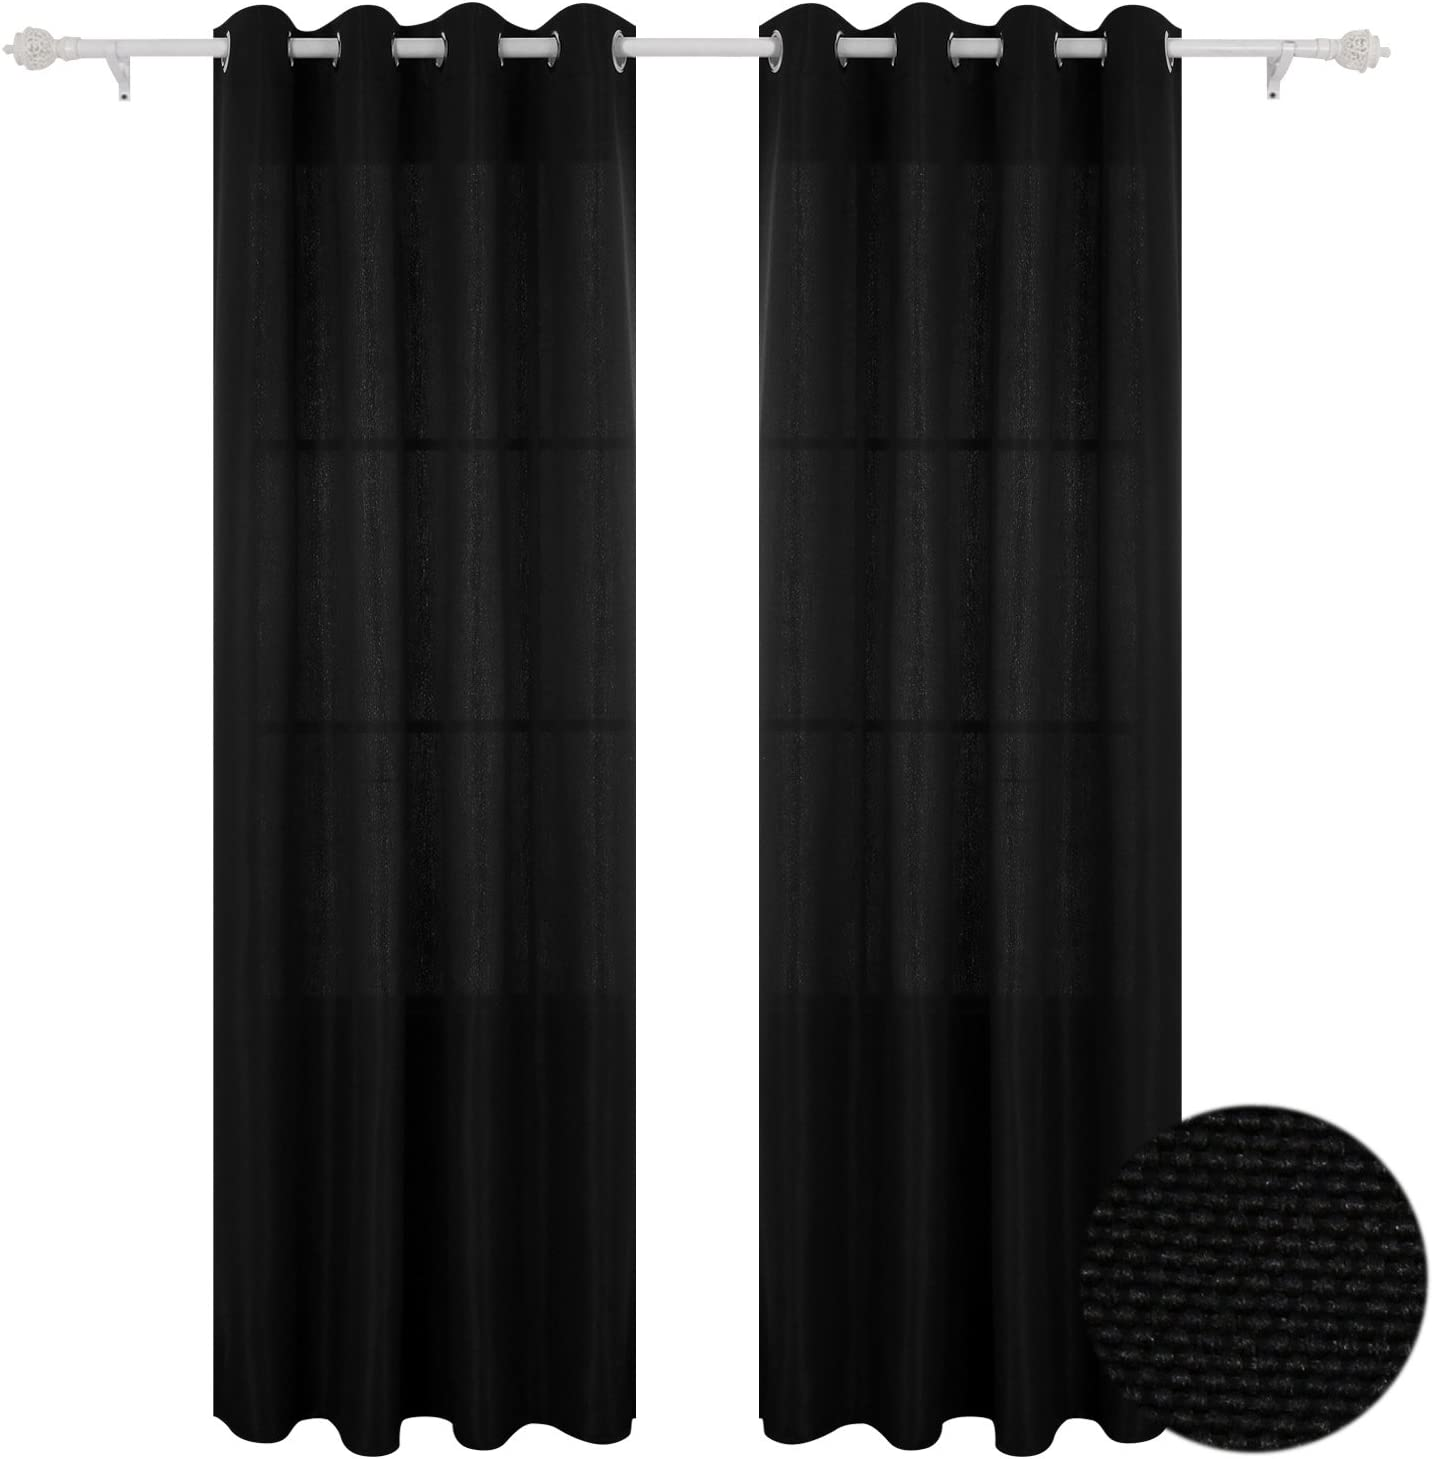 Deconovo Darkening Grommet lowest price New popularity Faux Linen Curtains Darpes f Blackout